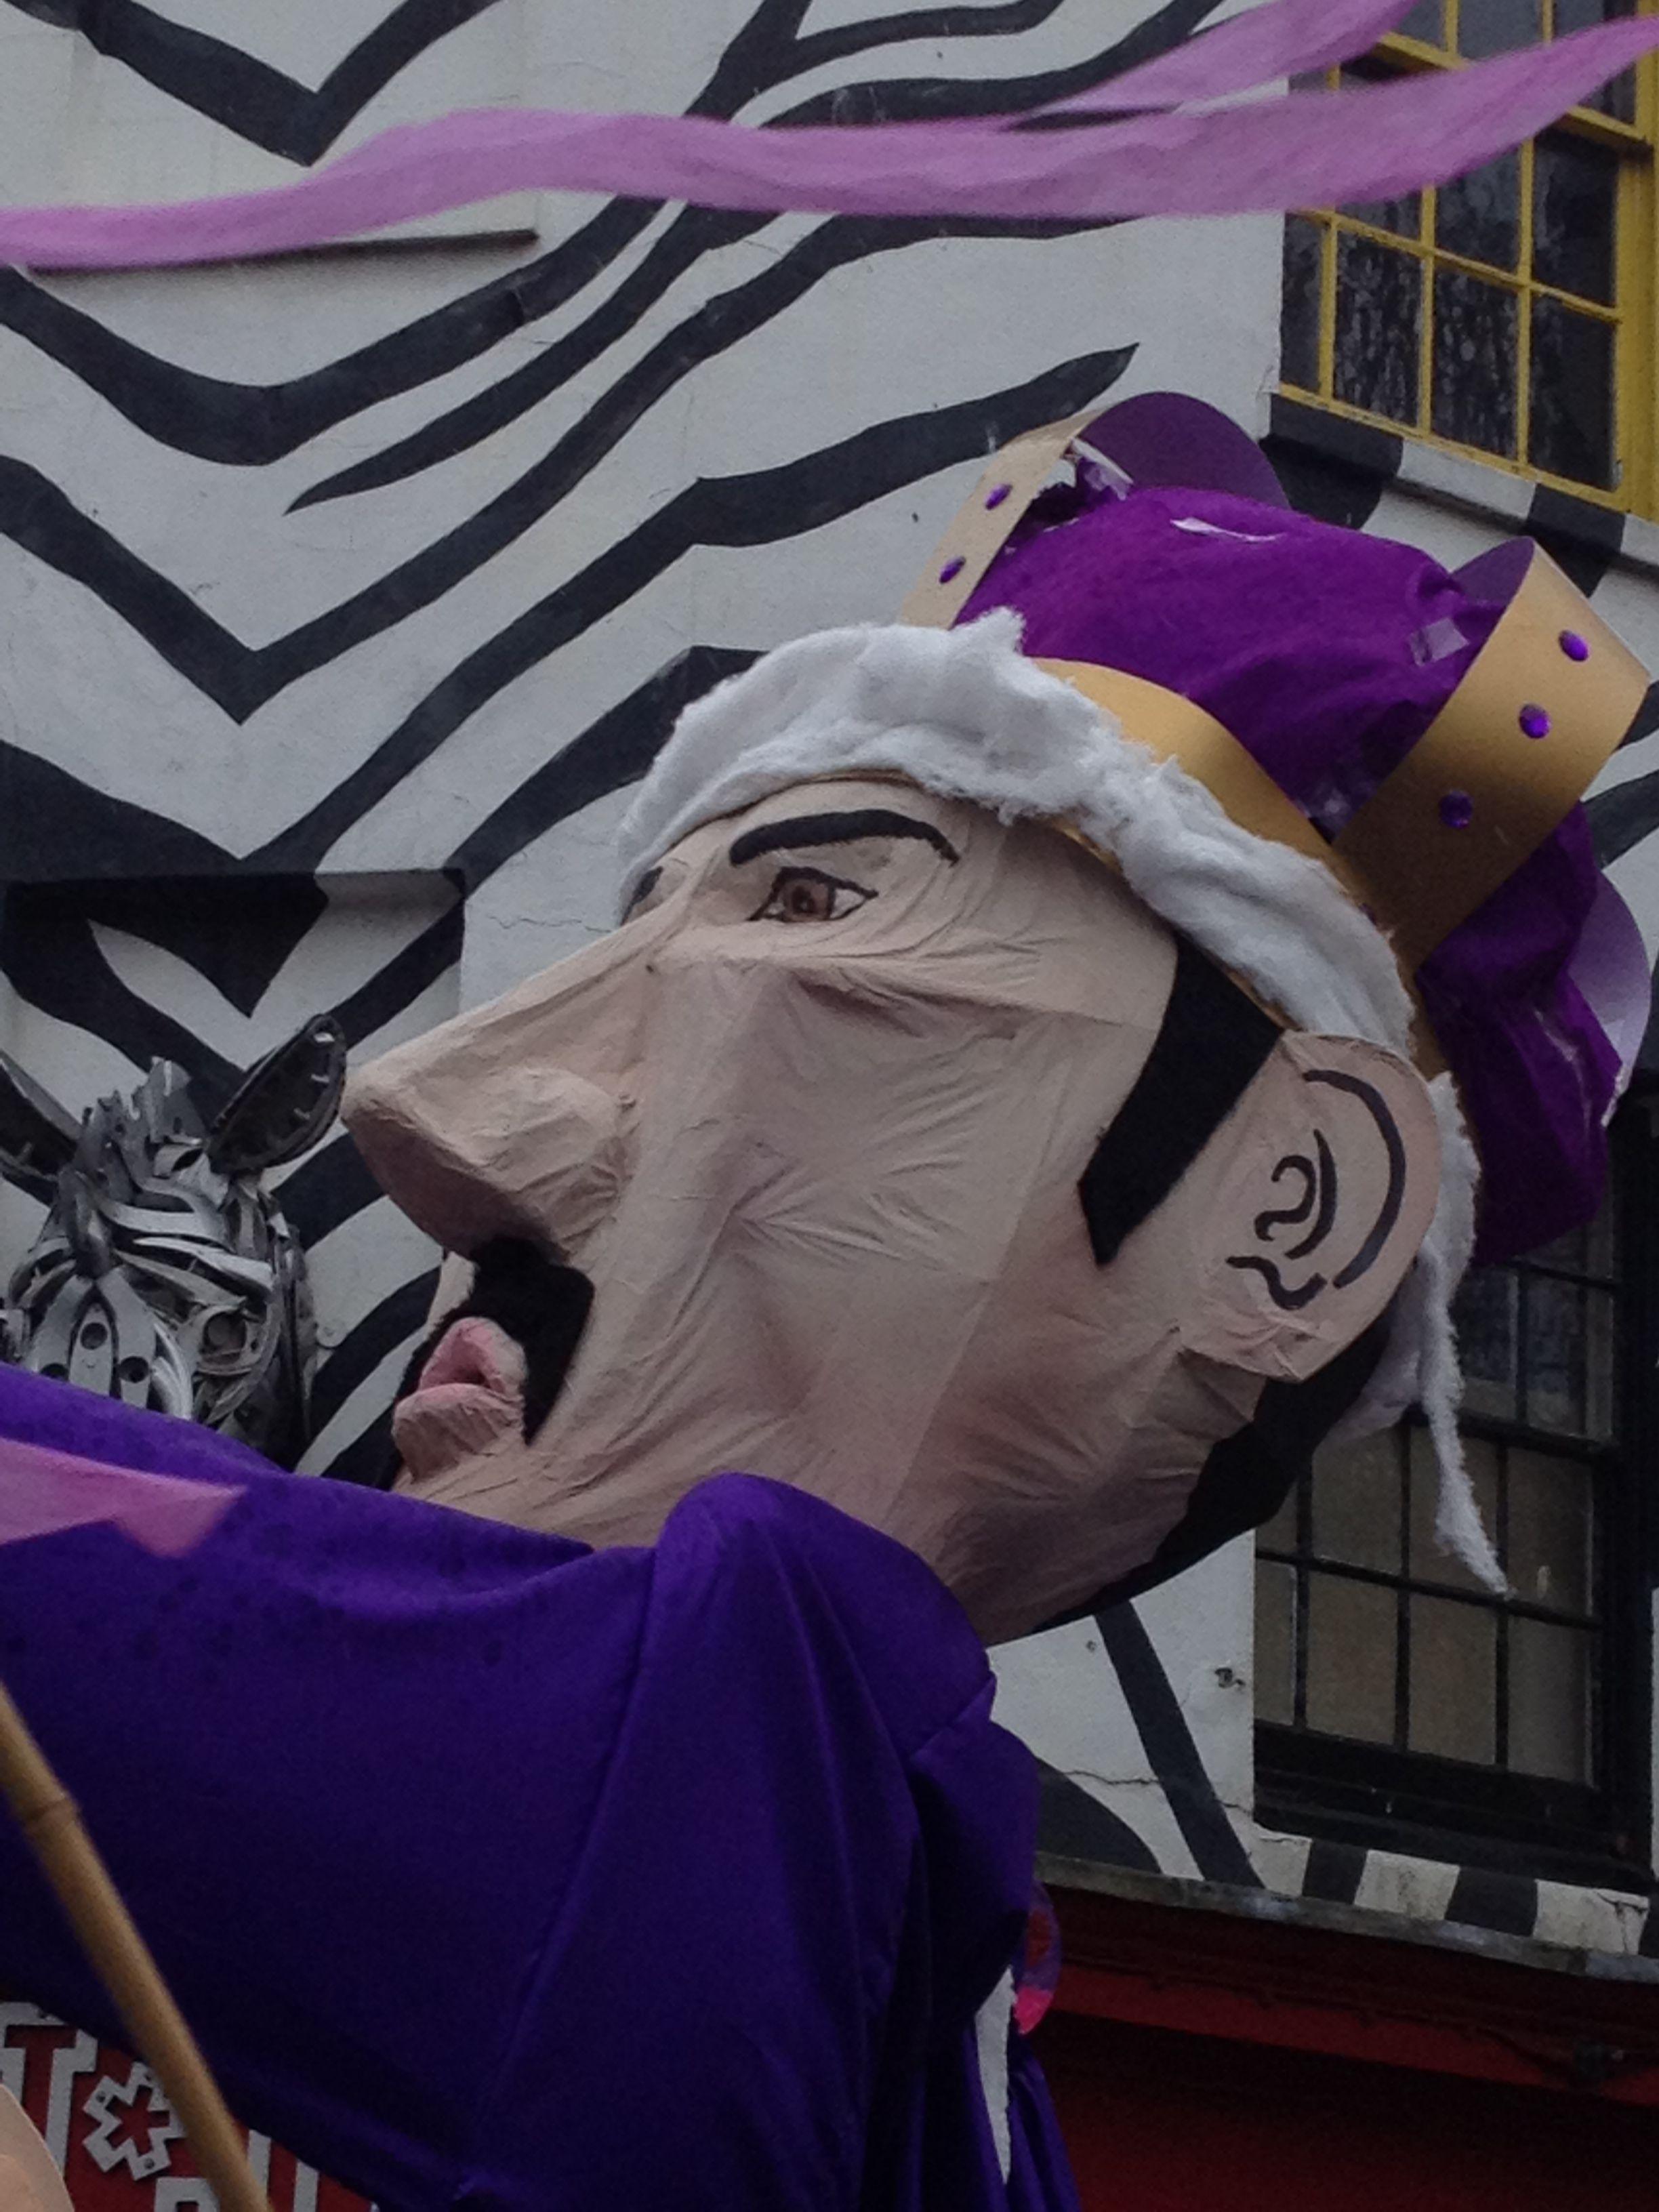 Brighton Festival Parade 2013- The King